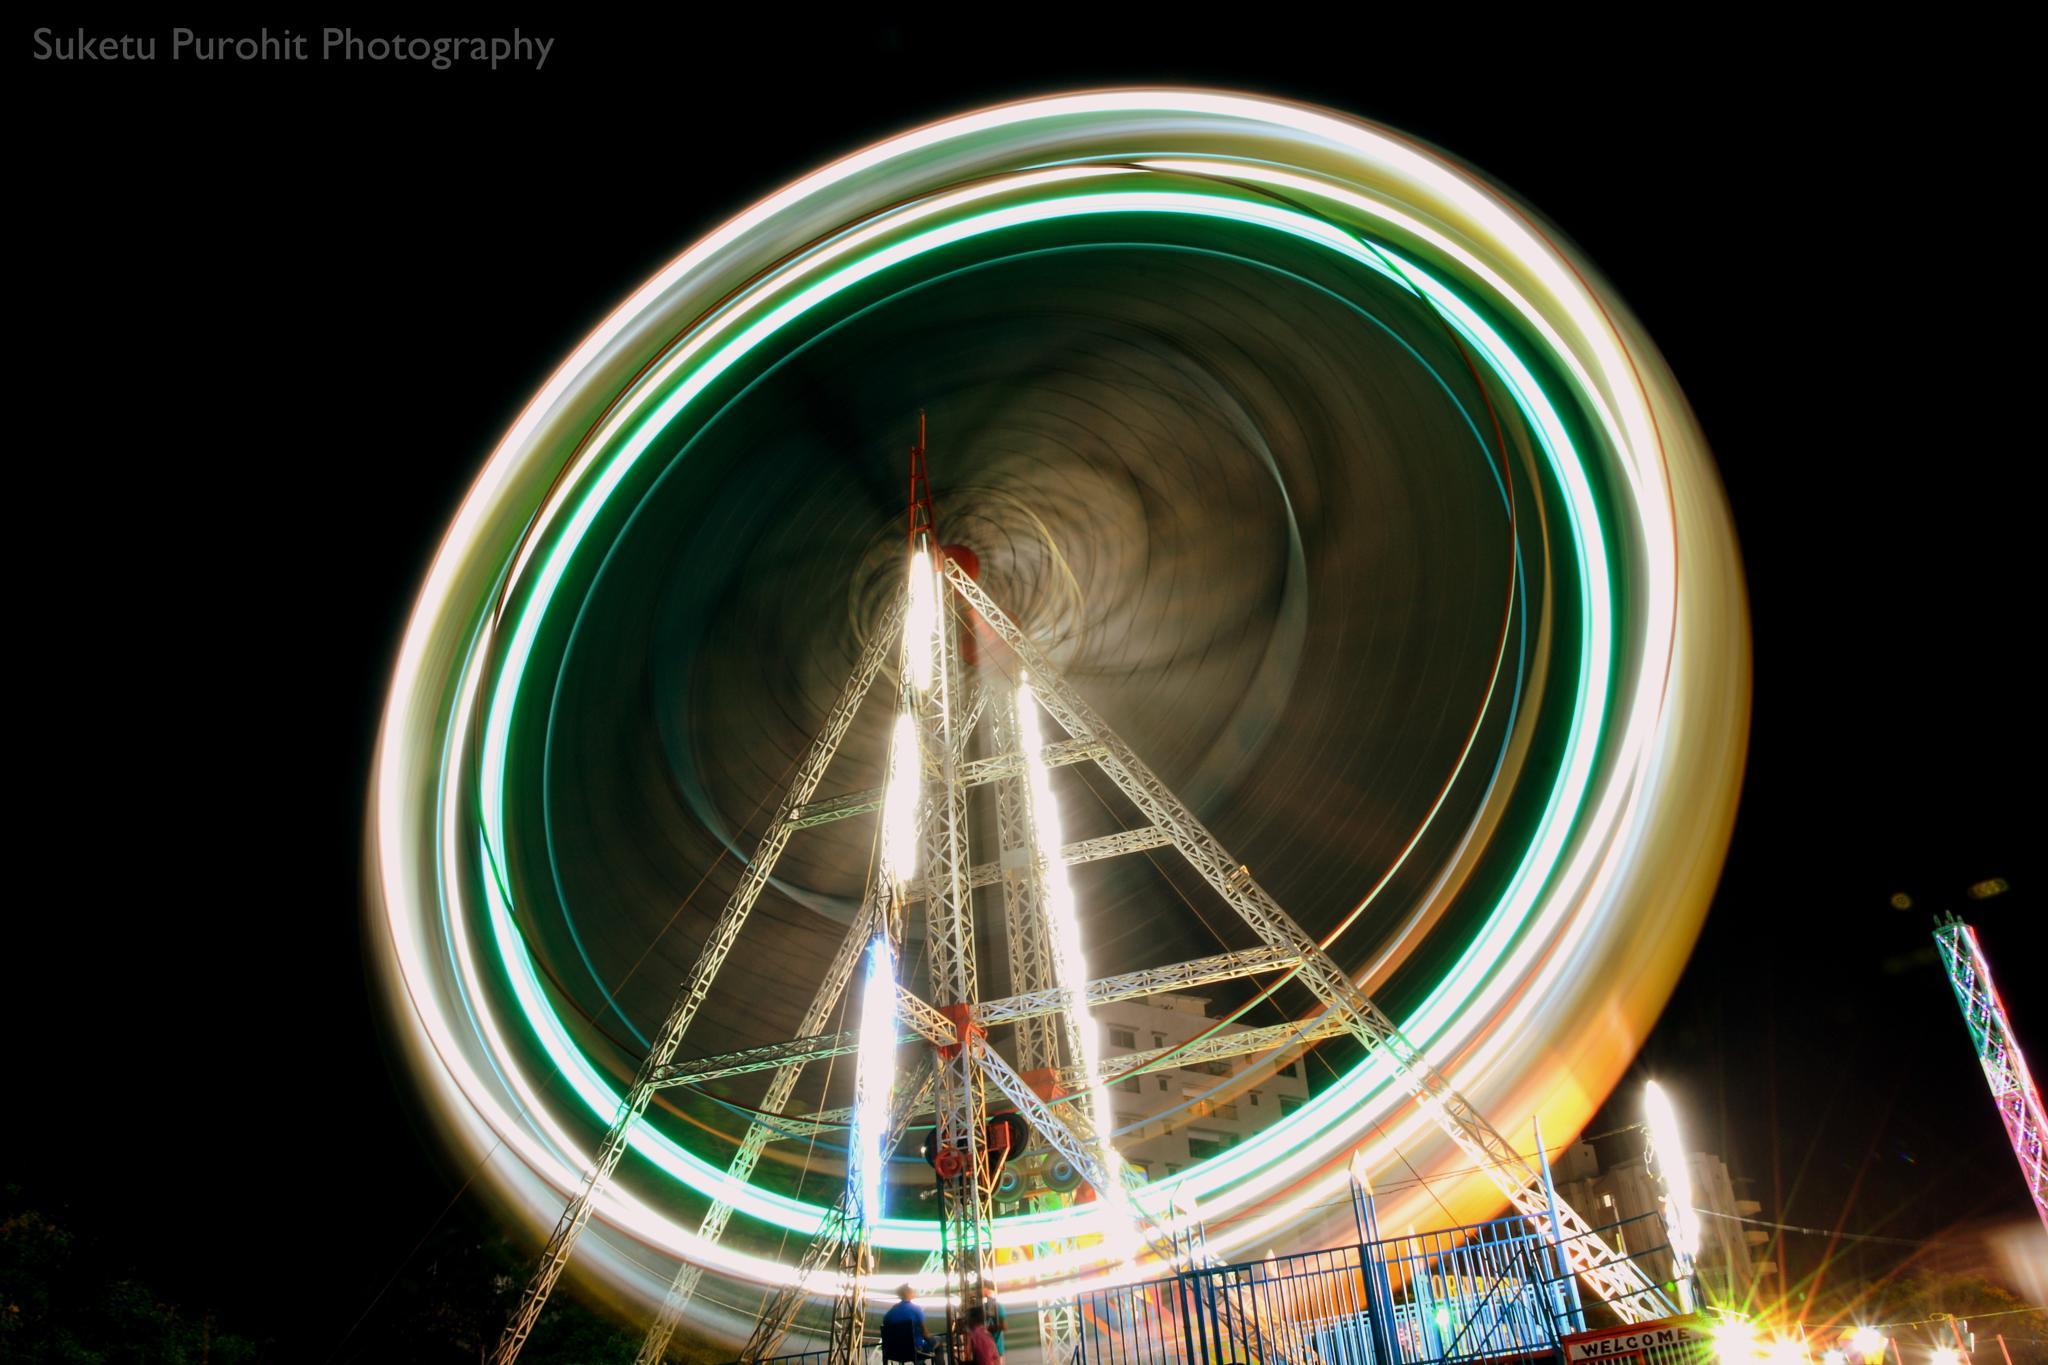 Merry-go-round & Nightscape by Suketu Purohit